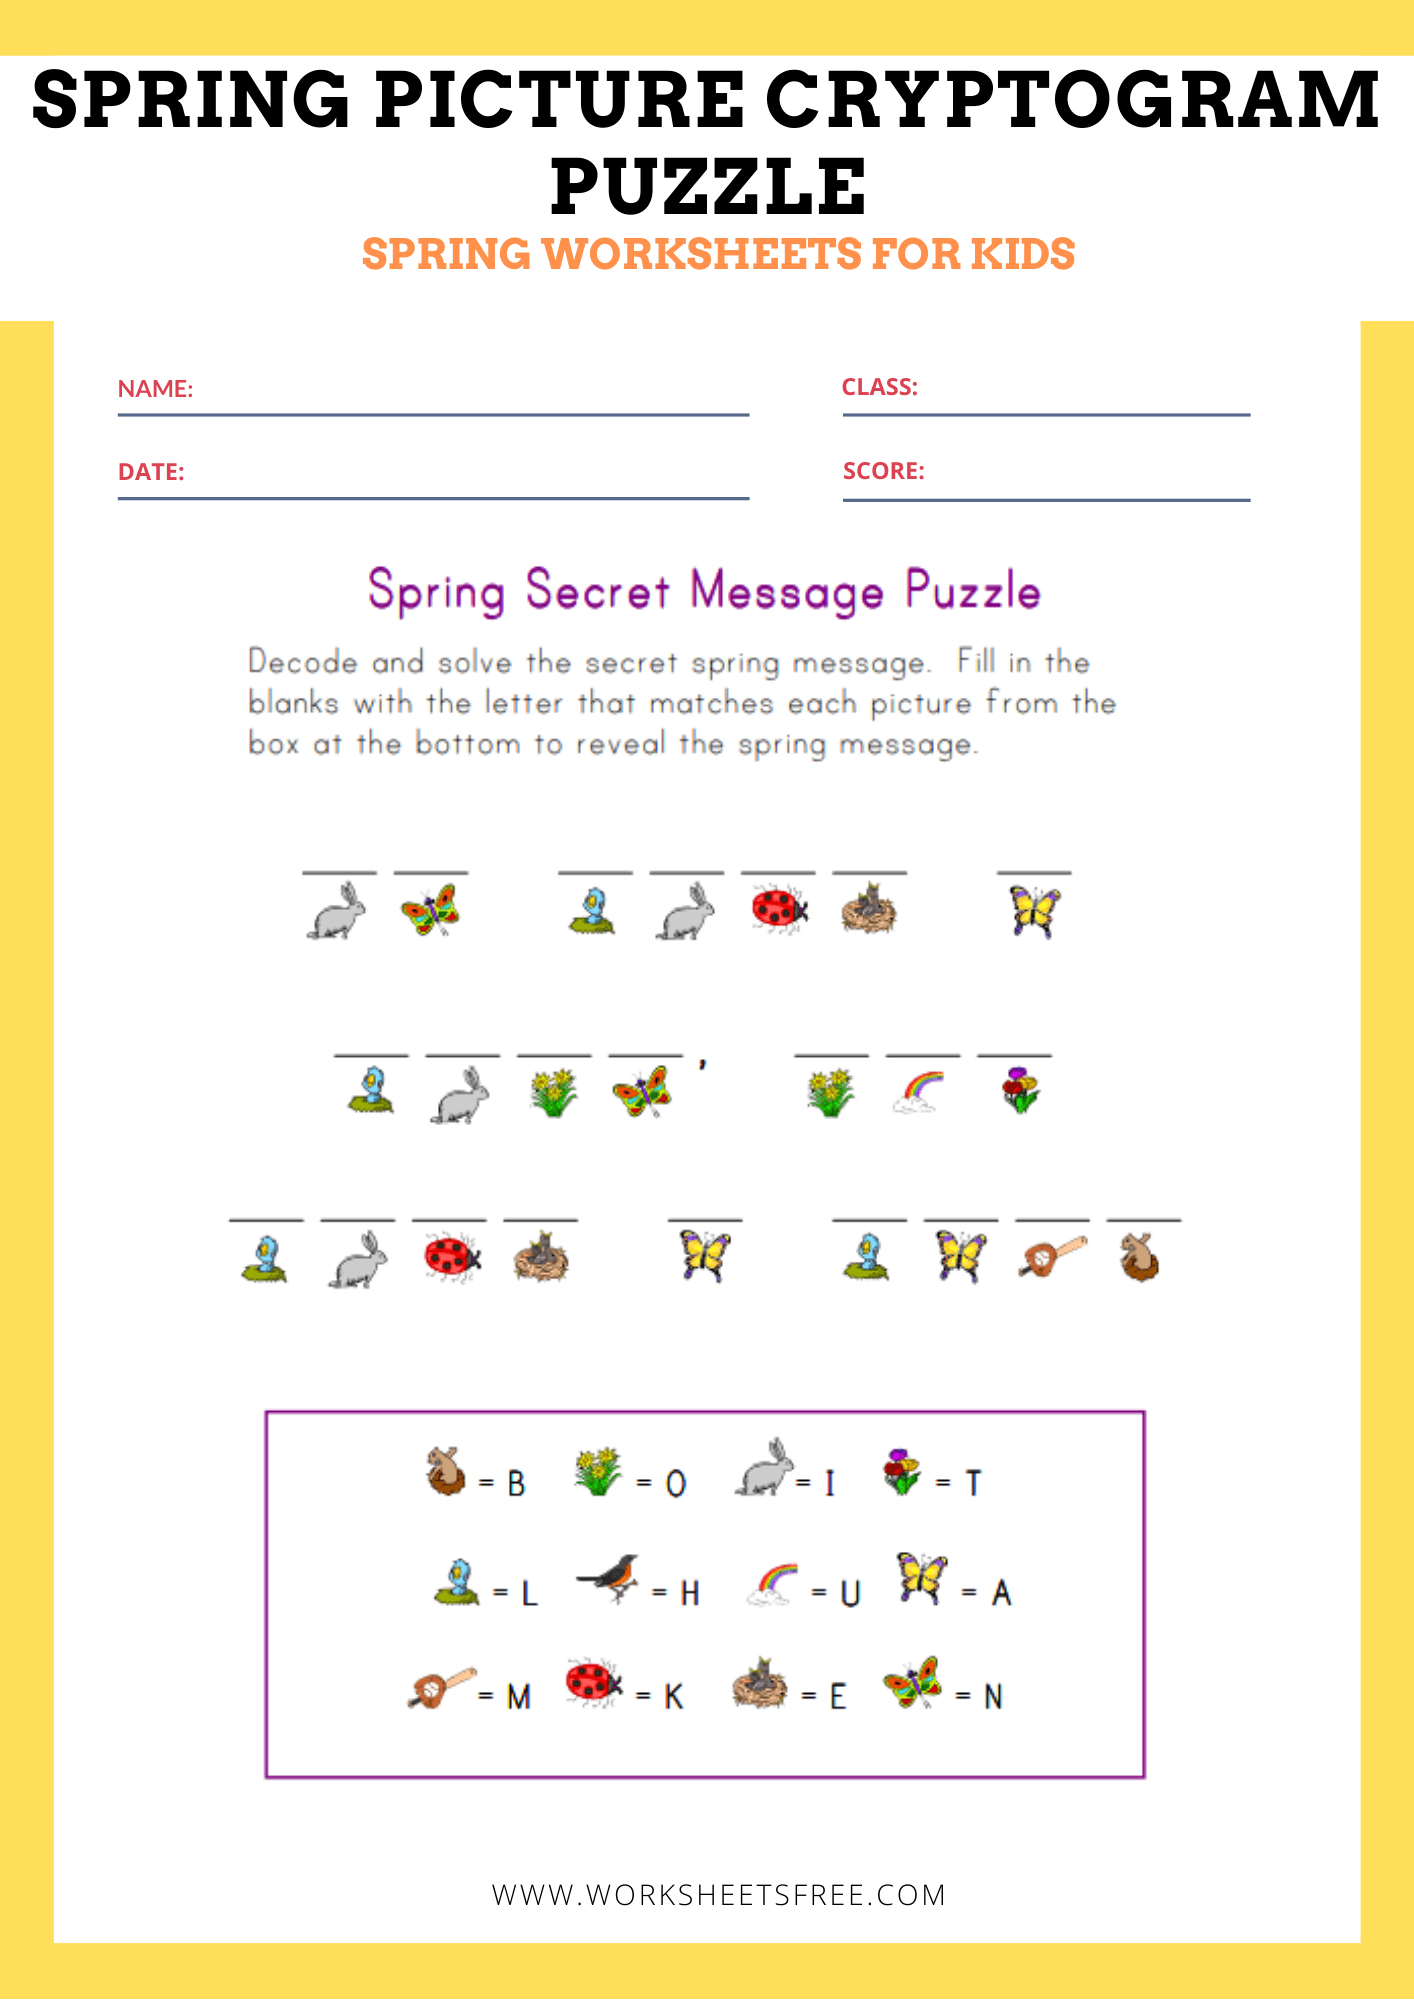 Spring Picture Cryptogram Puzzle